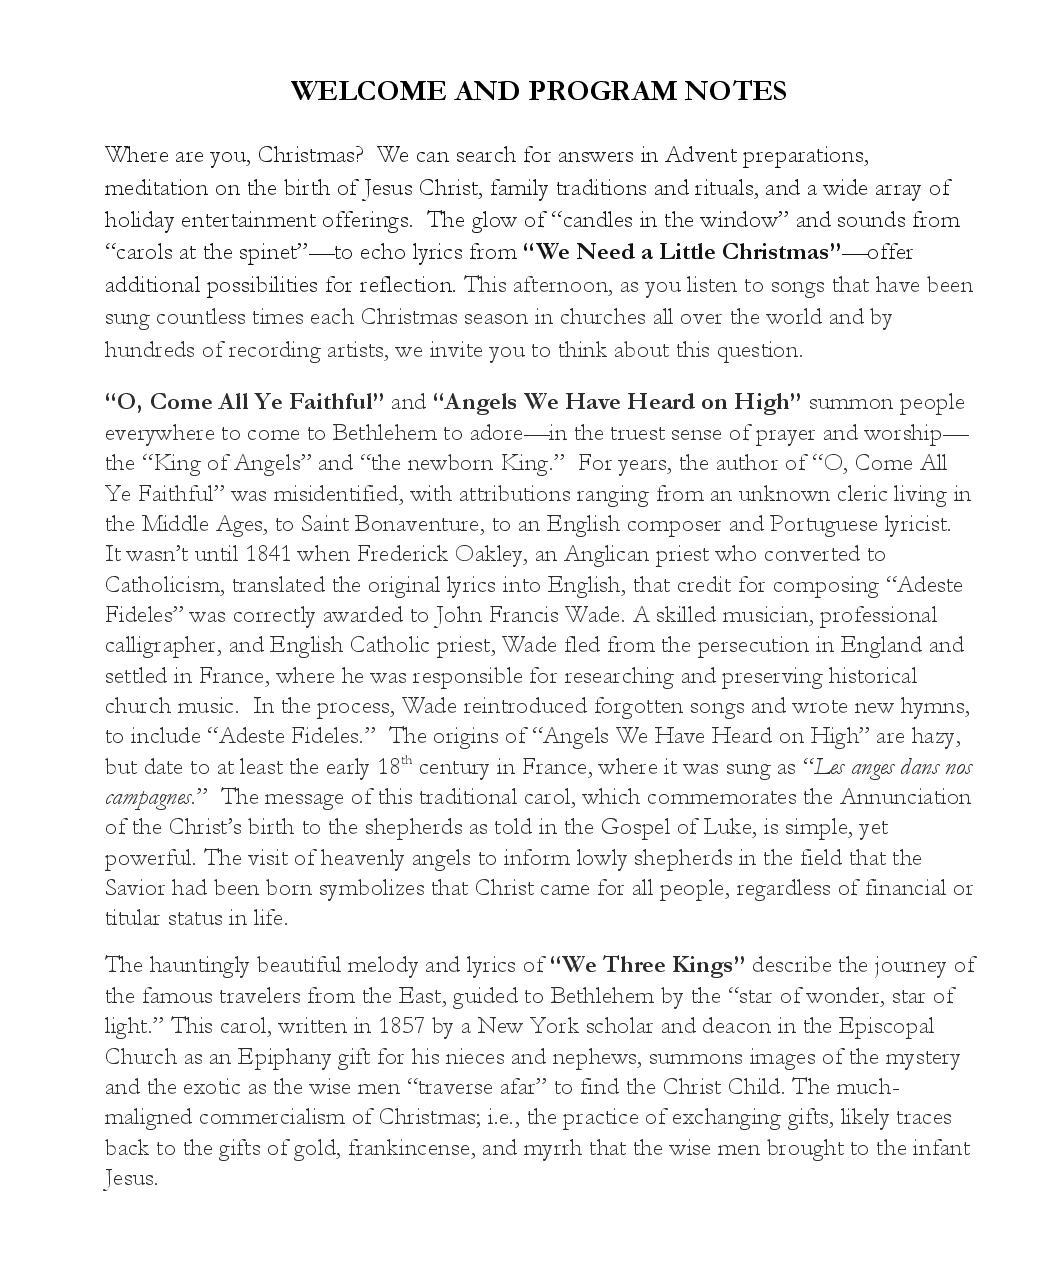 ChristmasProgram_14DEC18-FINAL-REV3-page-003.jpg